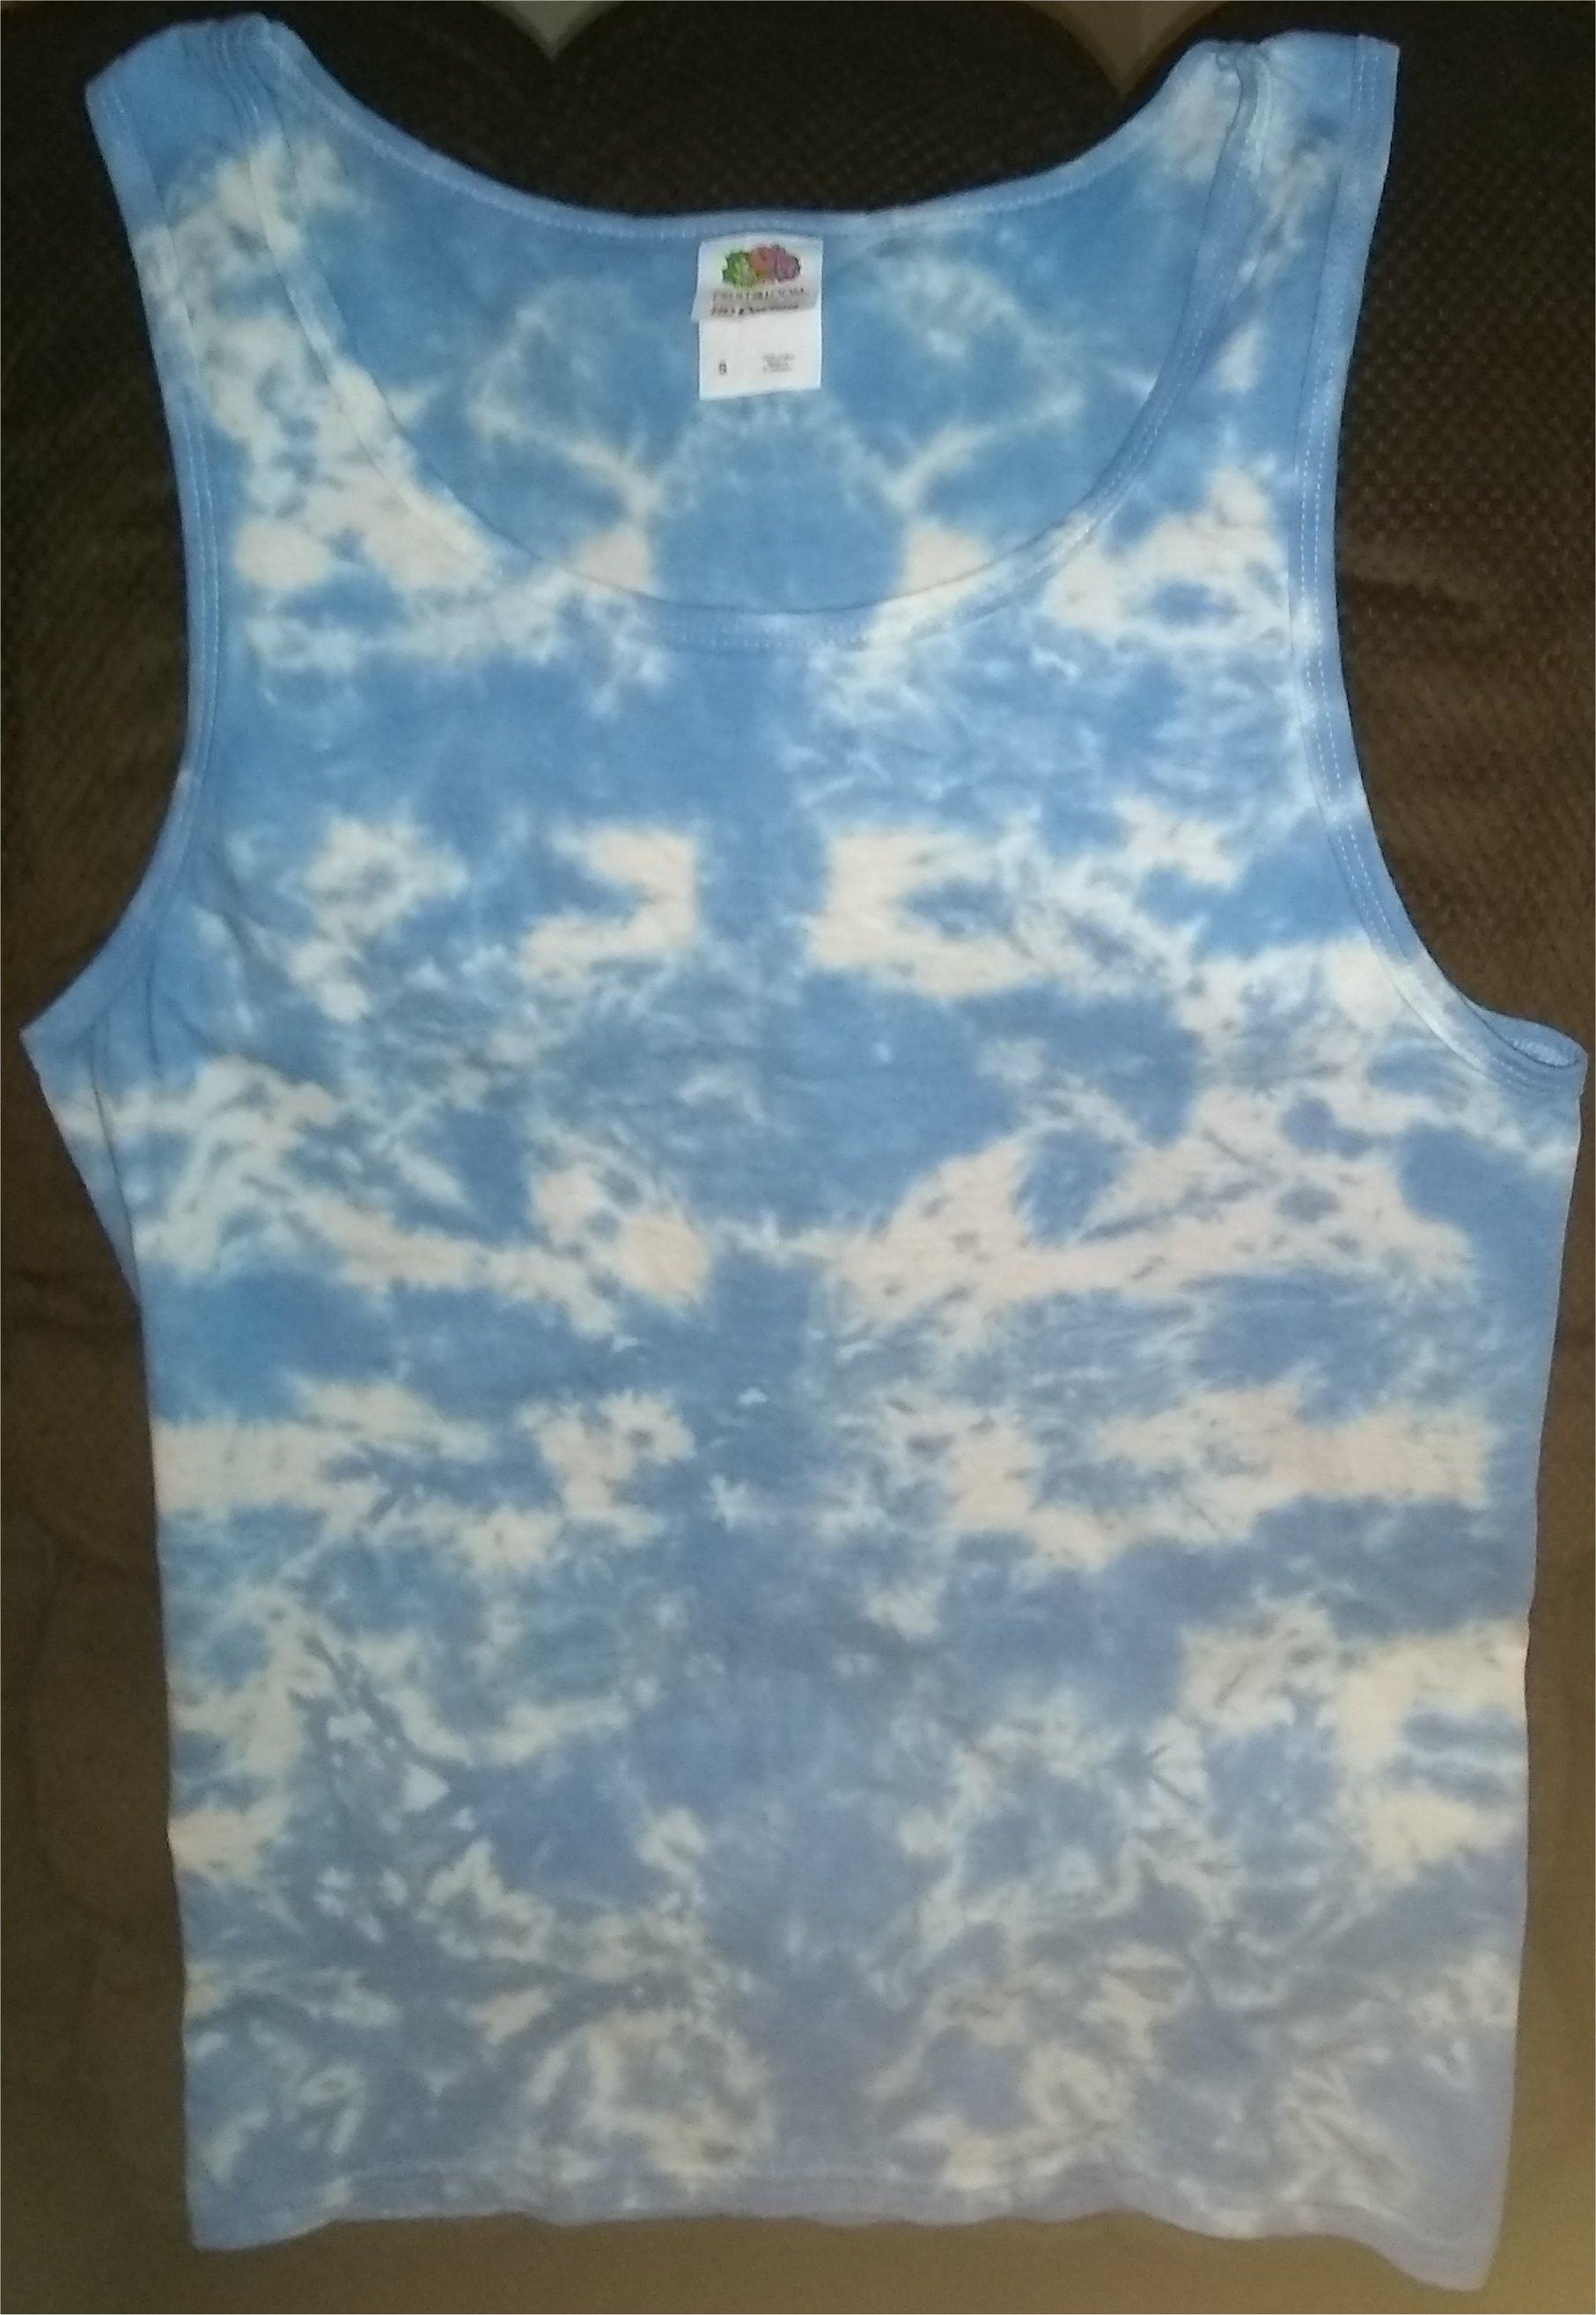 Electric Clouds Tie Dye Tank Top Size: S